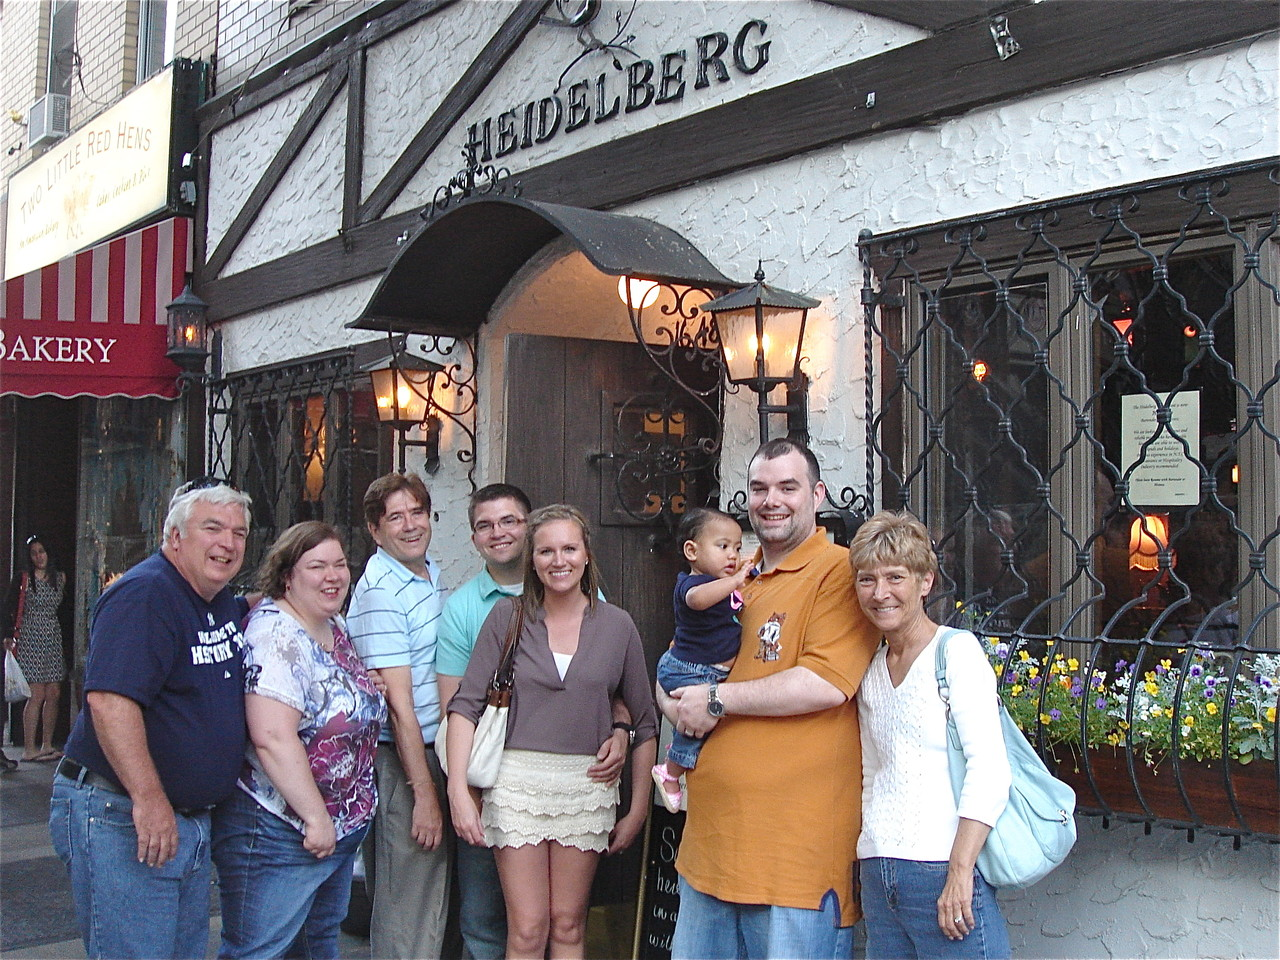 Steve Theisen, Jessica, John Wagner, Jonathan, Katie, Josie, Nick, & Sue outside the Heidelberg Rest. NYC 6-20-2013